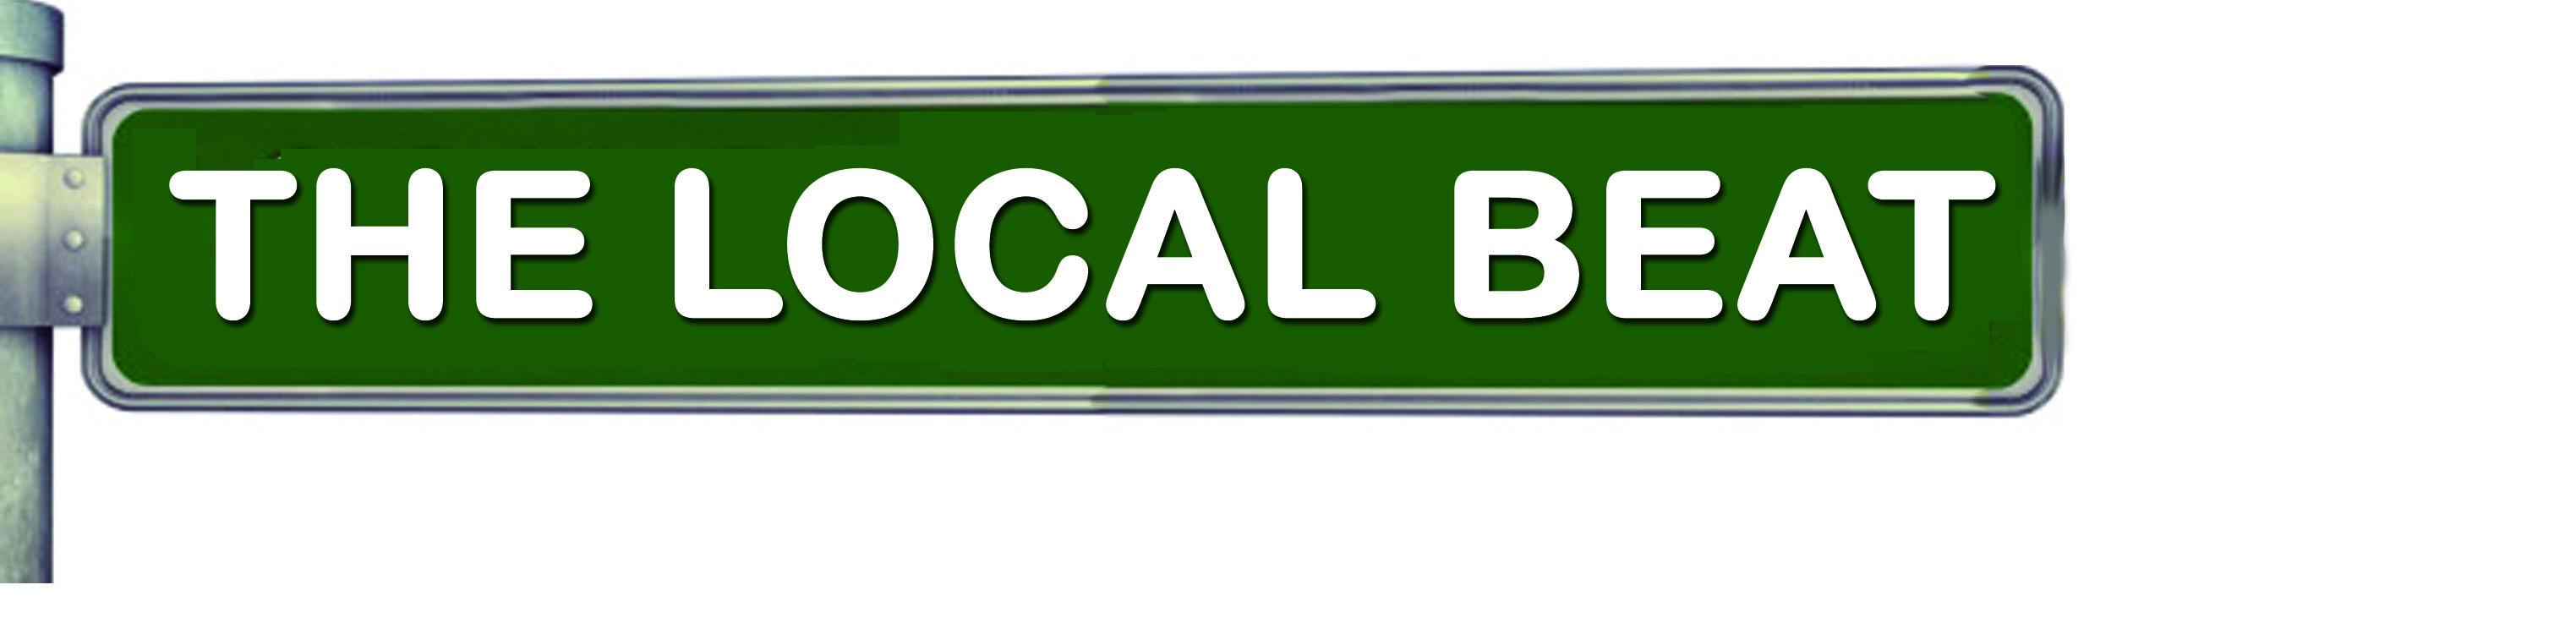 The Local Beat – News Roundup